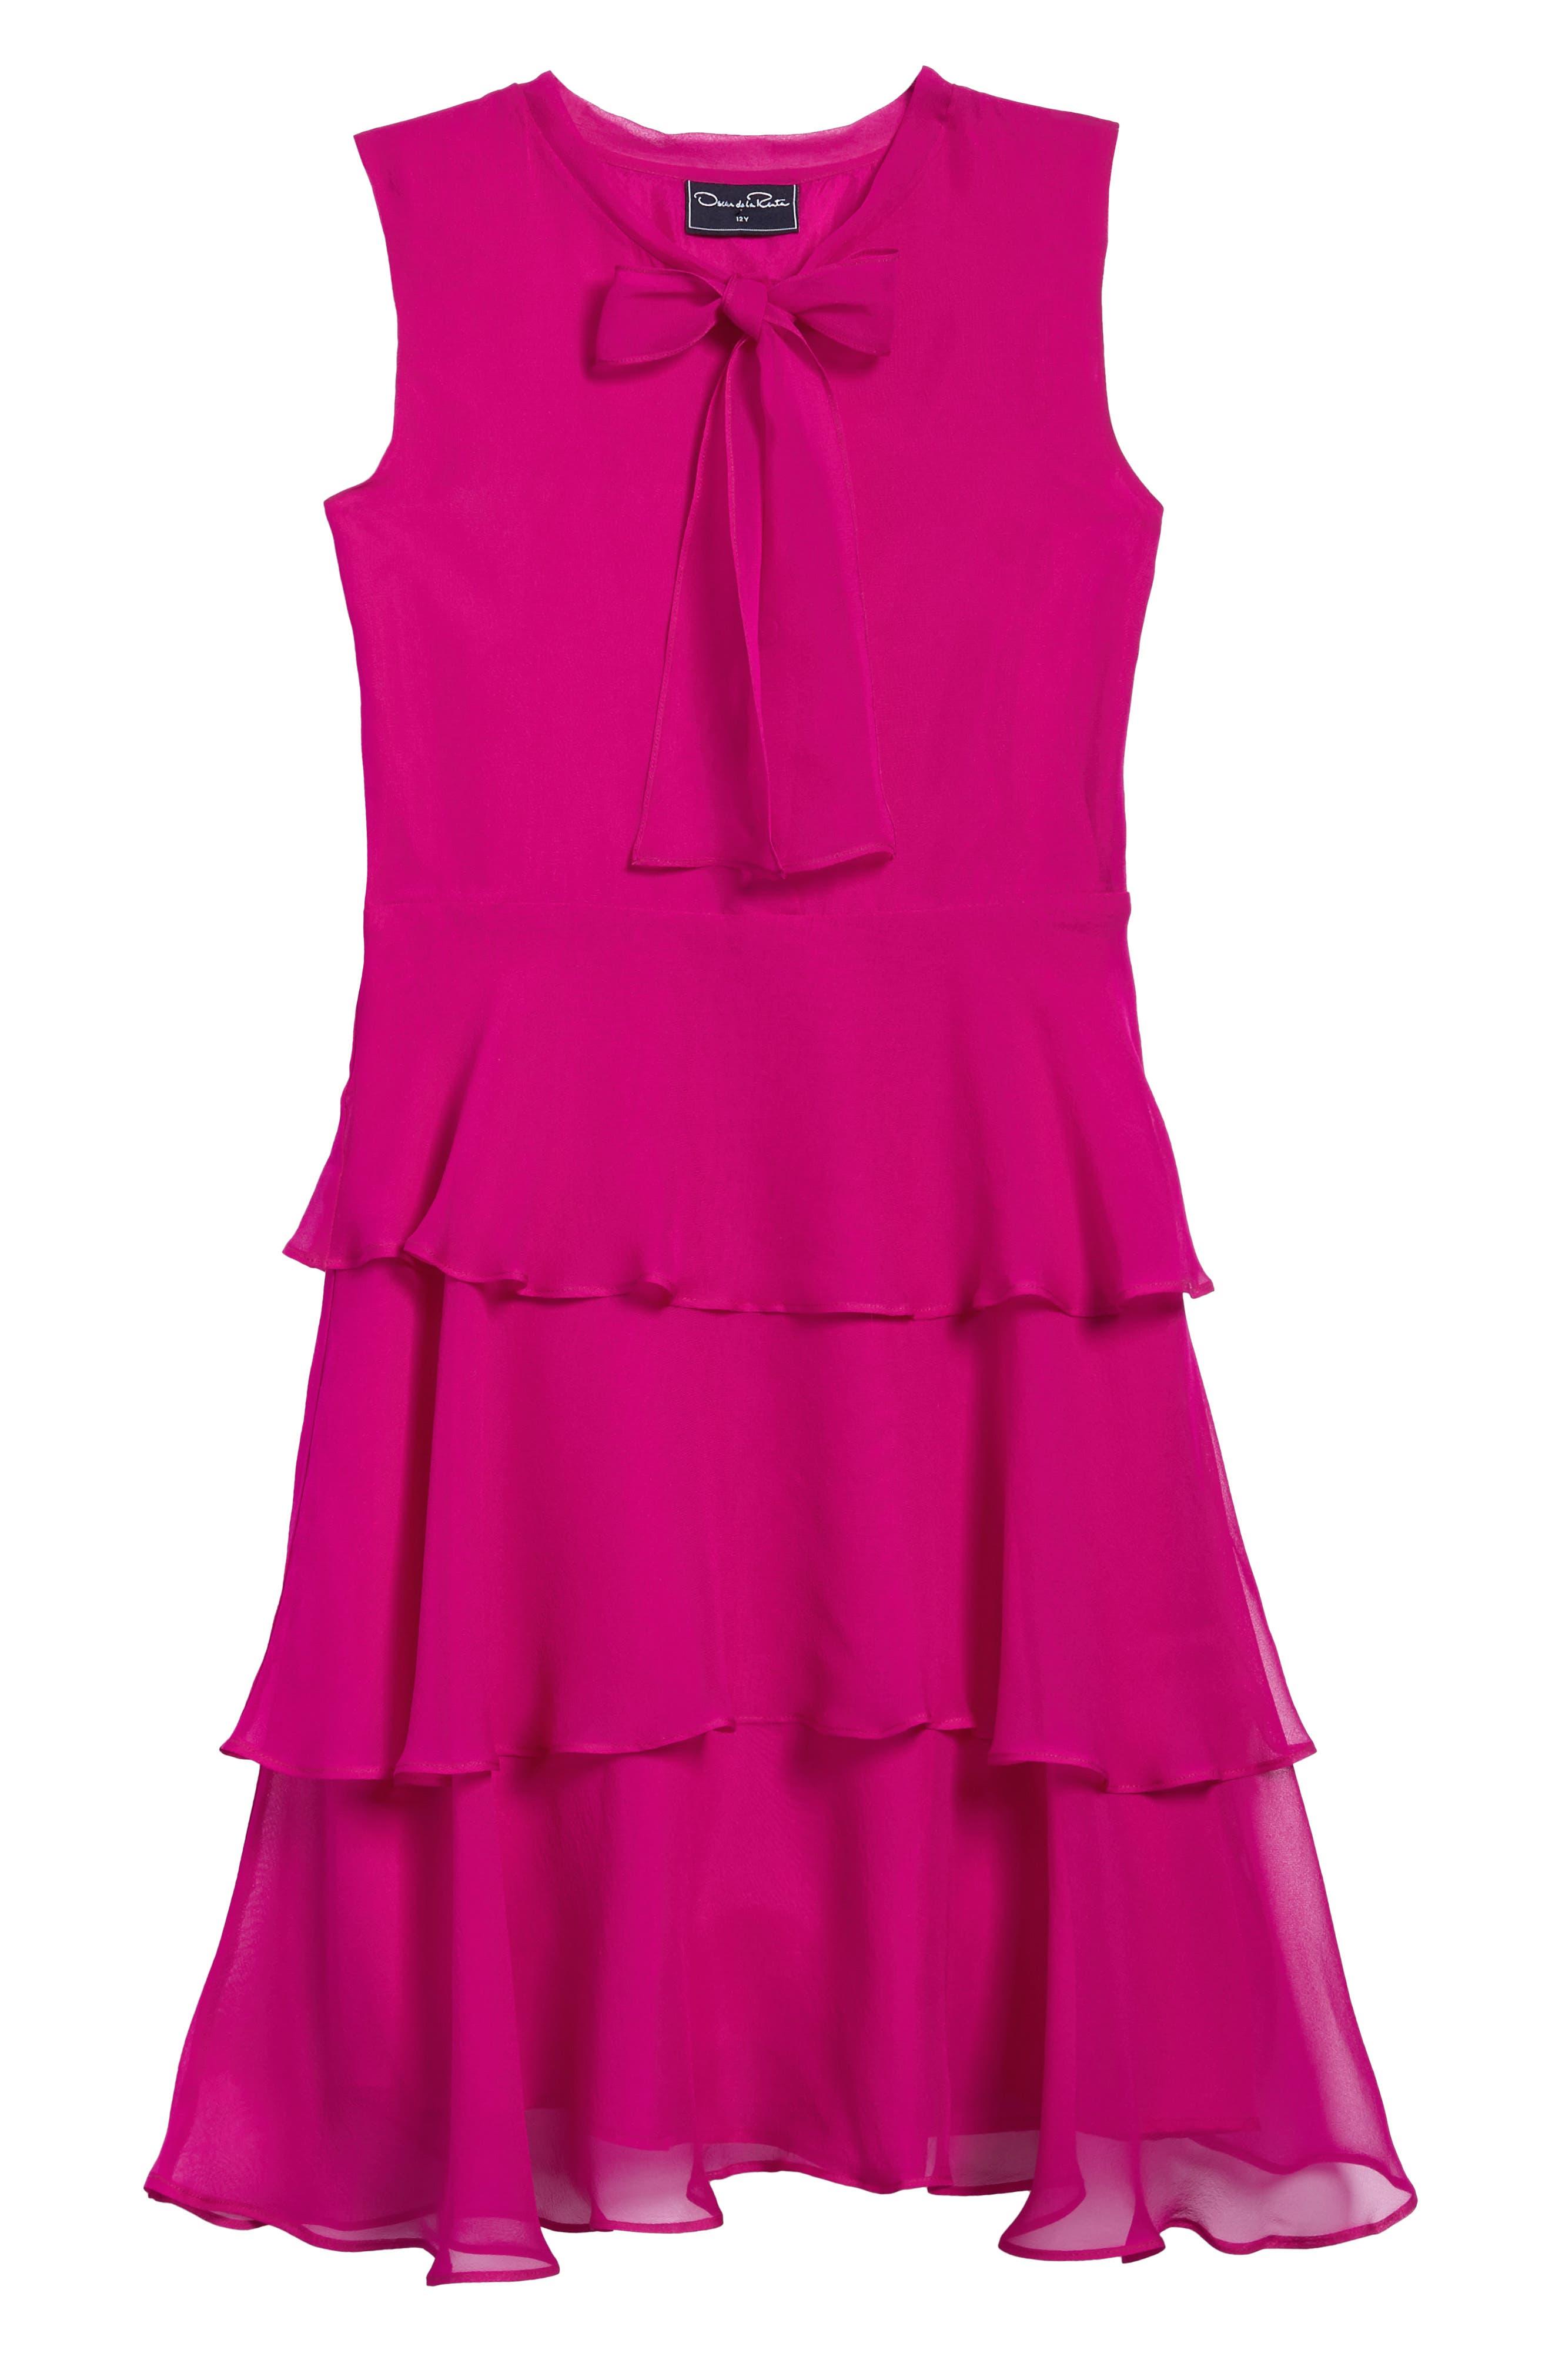 Main Image - Oscar de la Renta Tiered Silk Chiffon Dress (Toddler Girls, Little Girls & Big Girls)